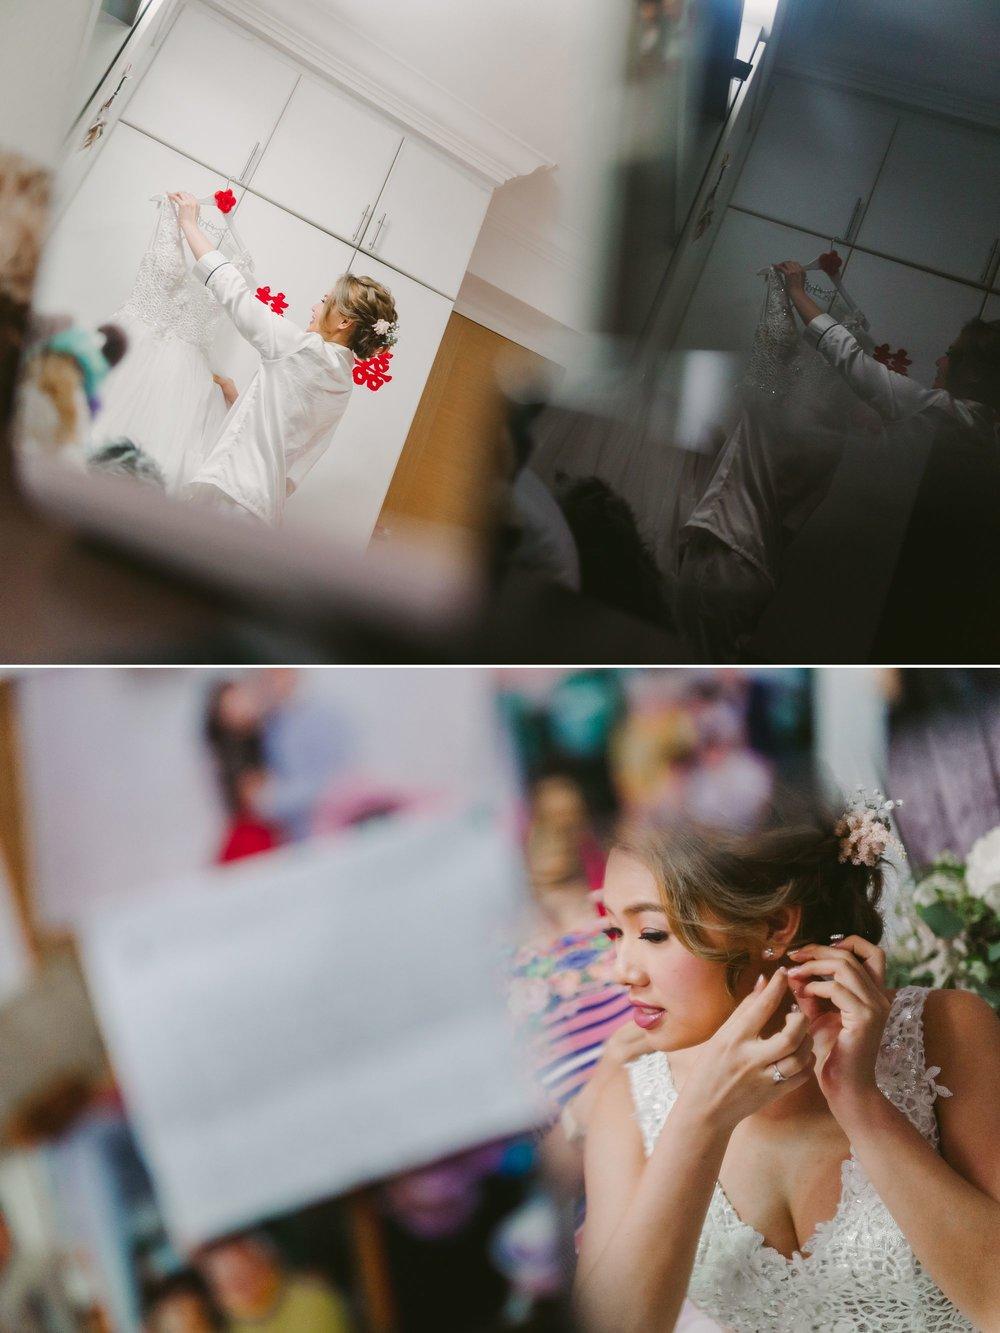 wedding_photographer_singapore 3.jpg